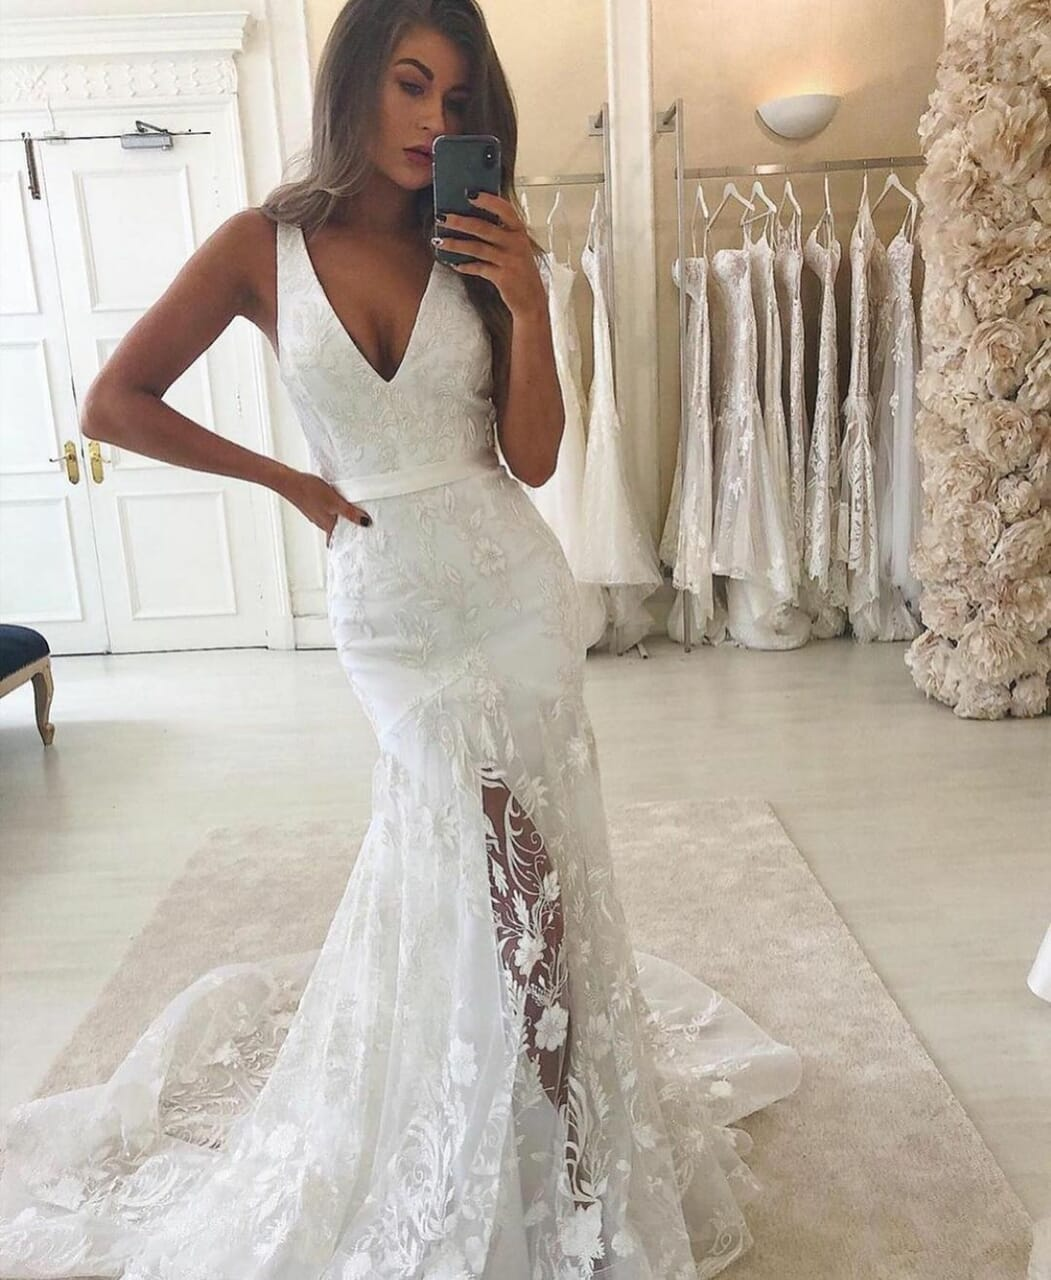 Blanc, bride, and dentelle image